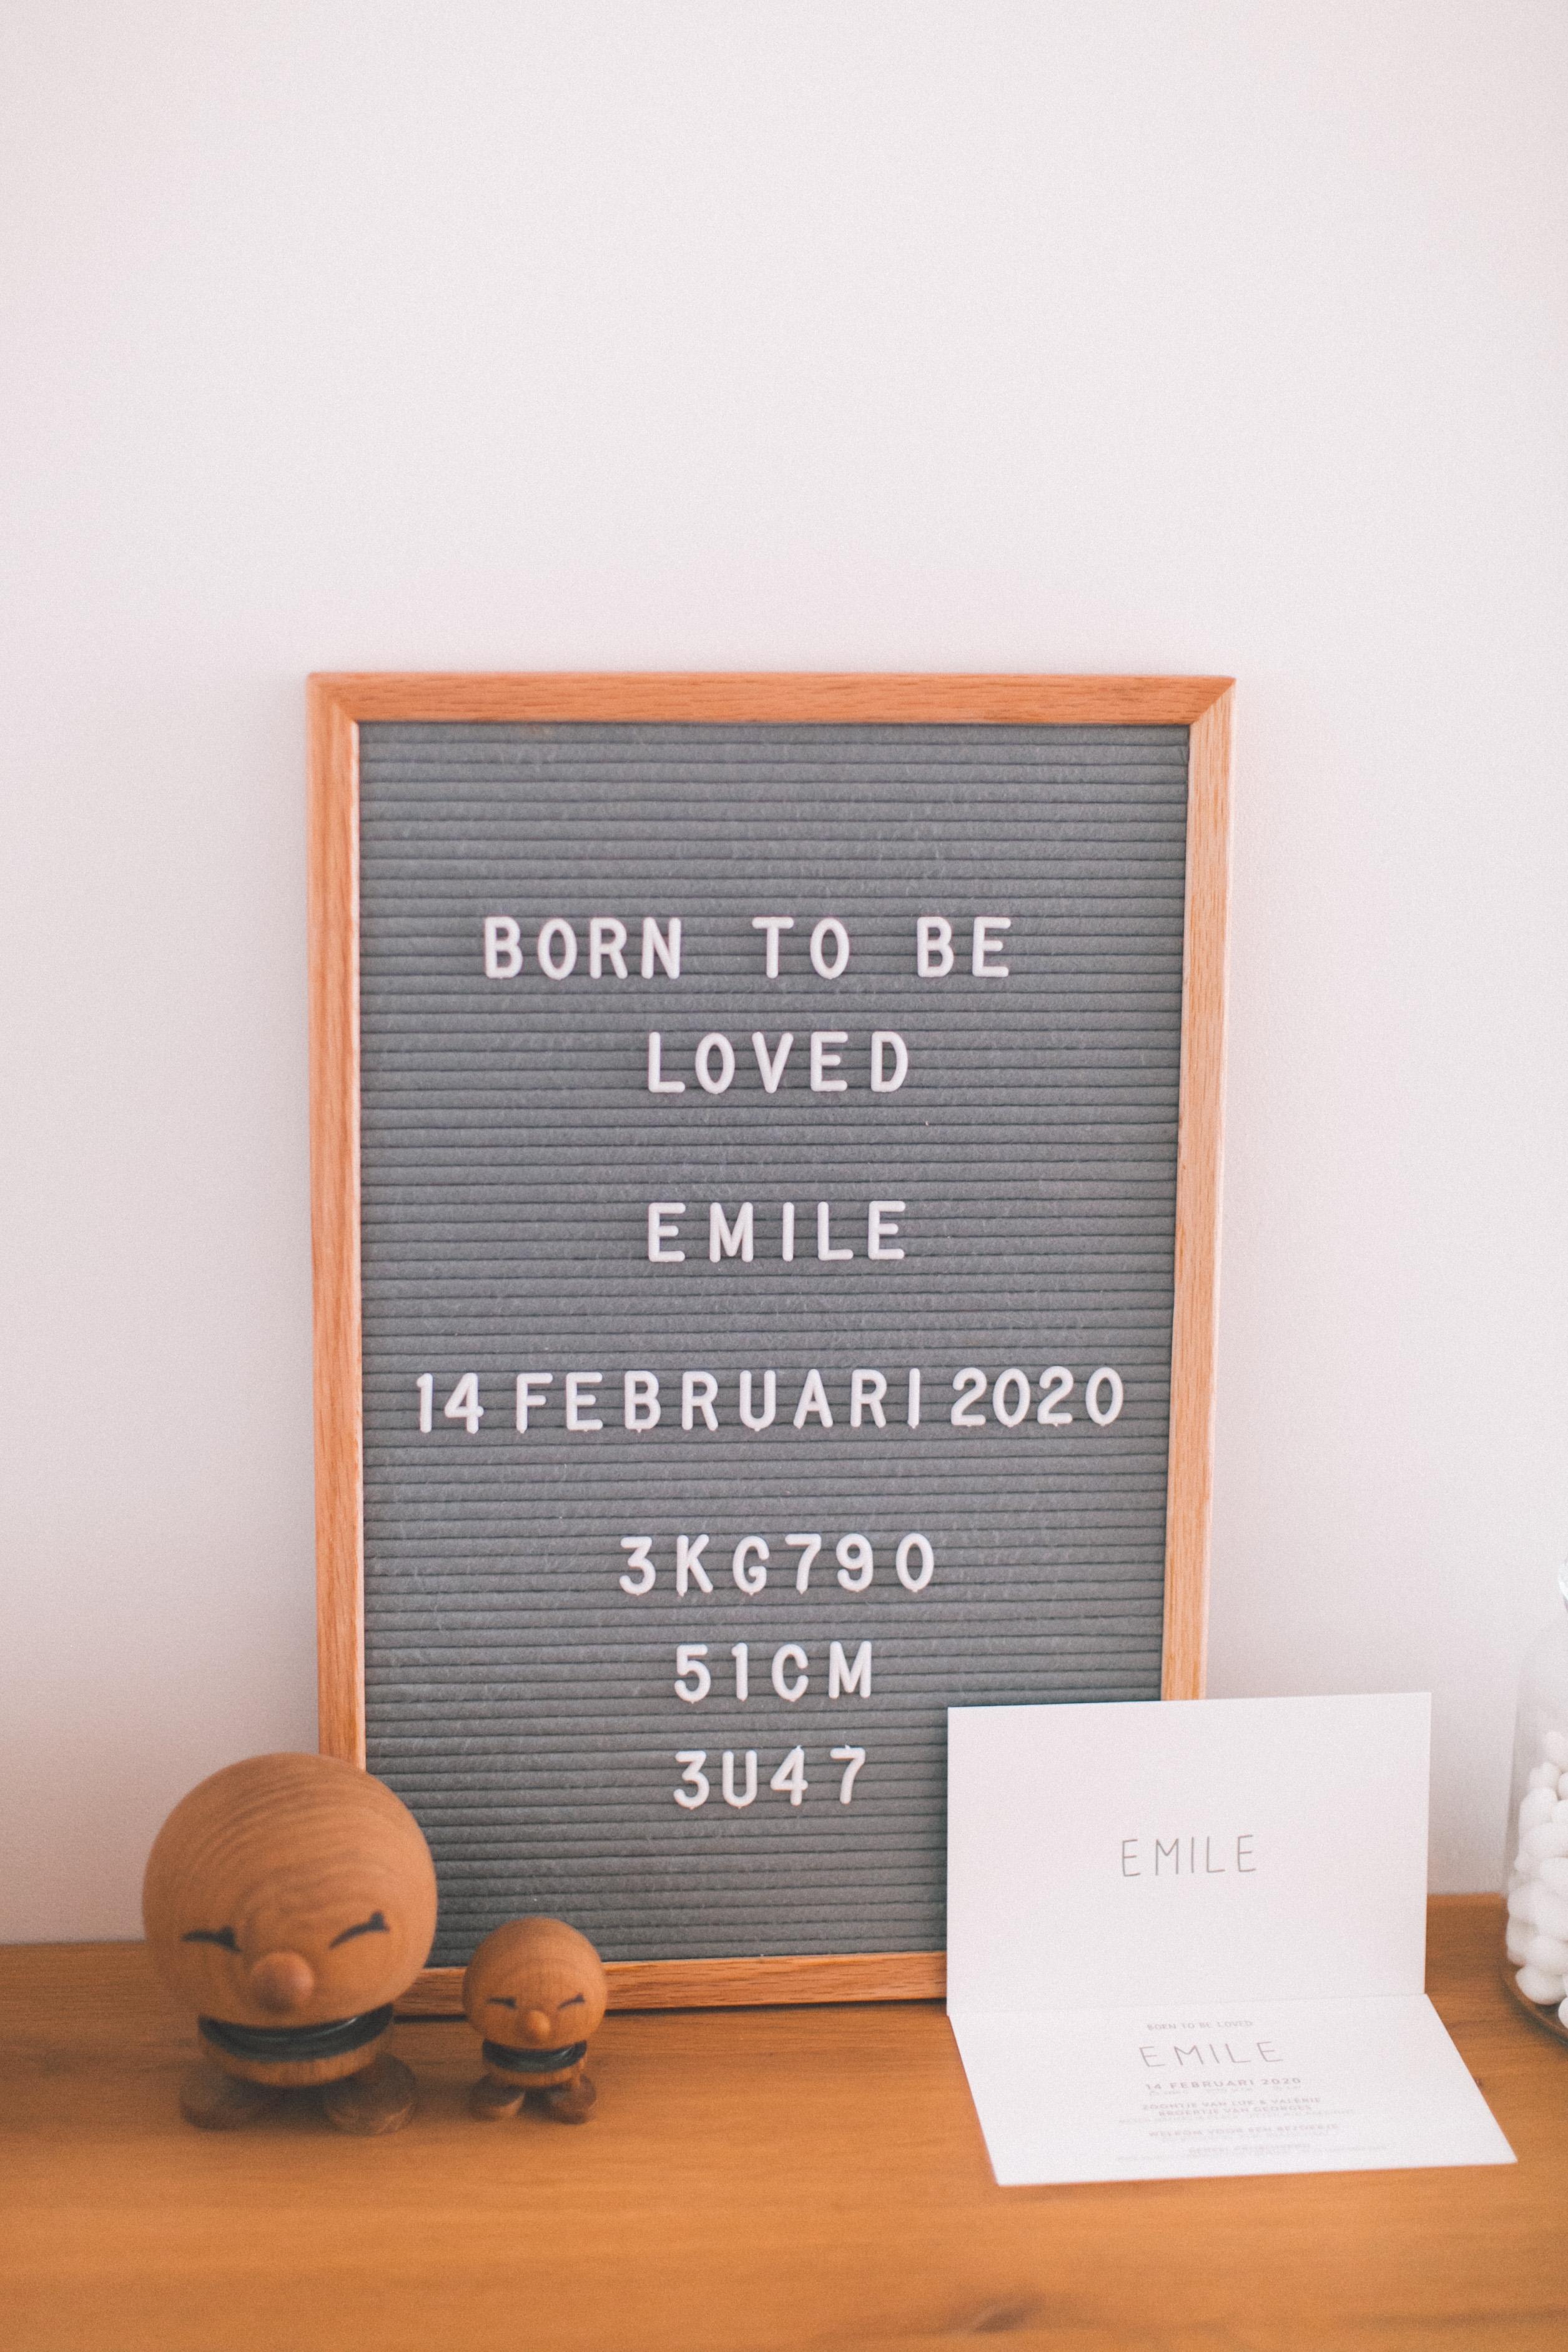 EMILE-9195